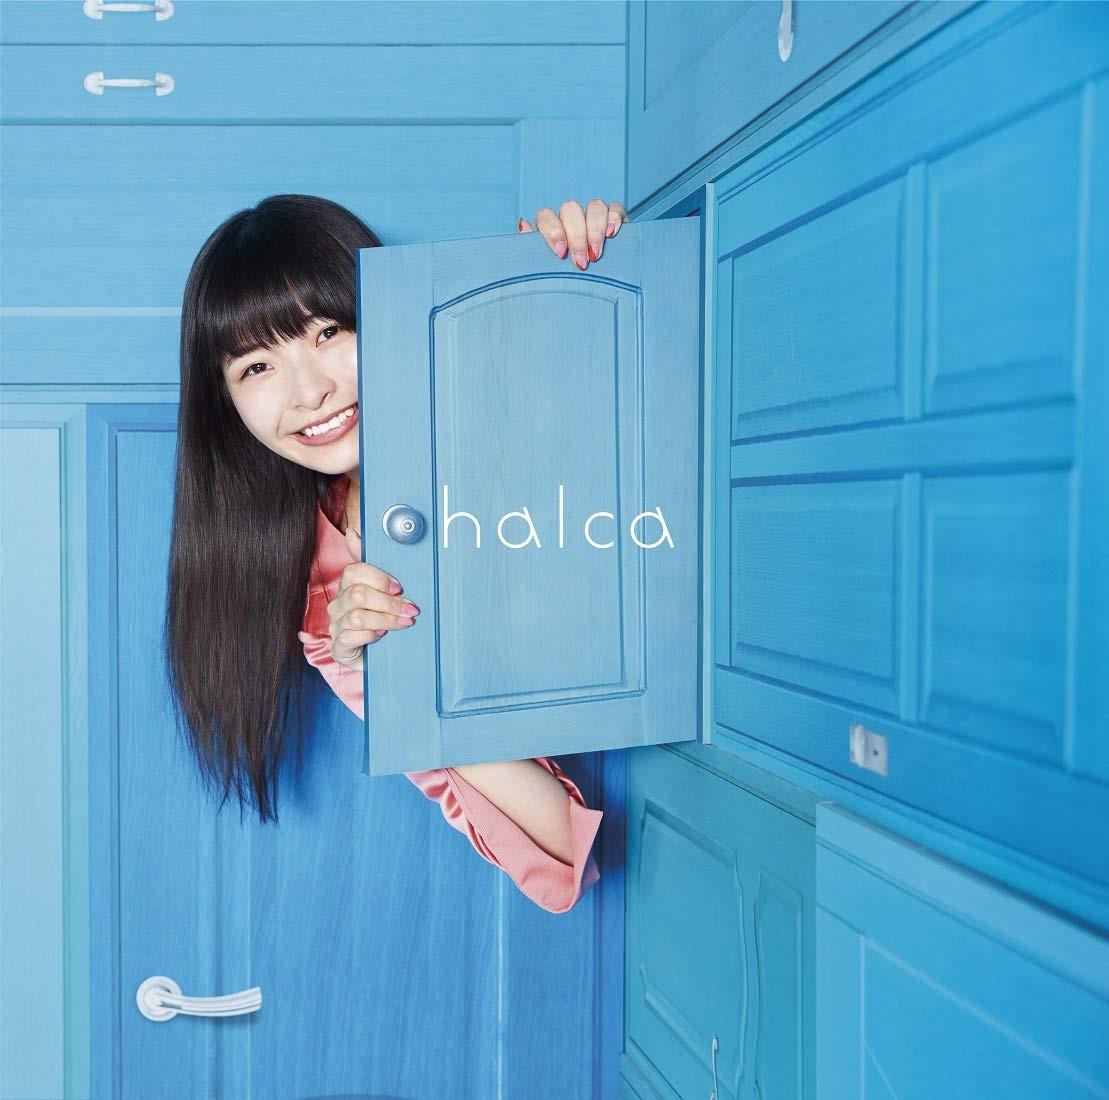 Halca – スターティングブルー [MP3 320 / CD] [2018.10.31]